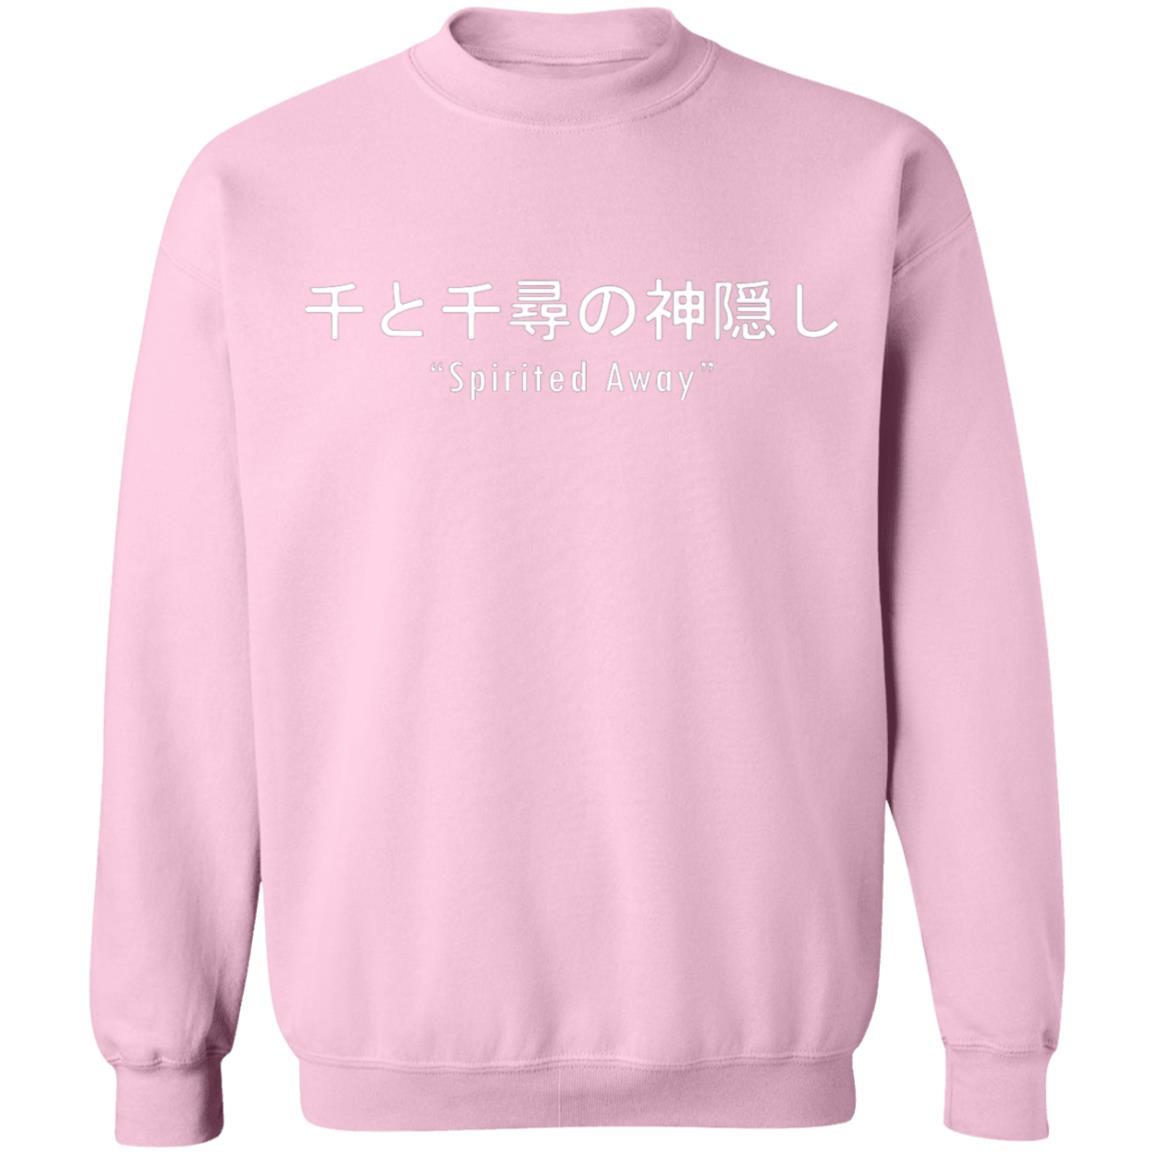 Spirited Away Japanese Letters Print Harajuku Sweatshirt